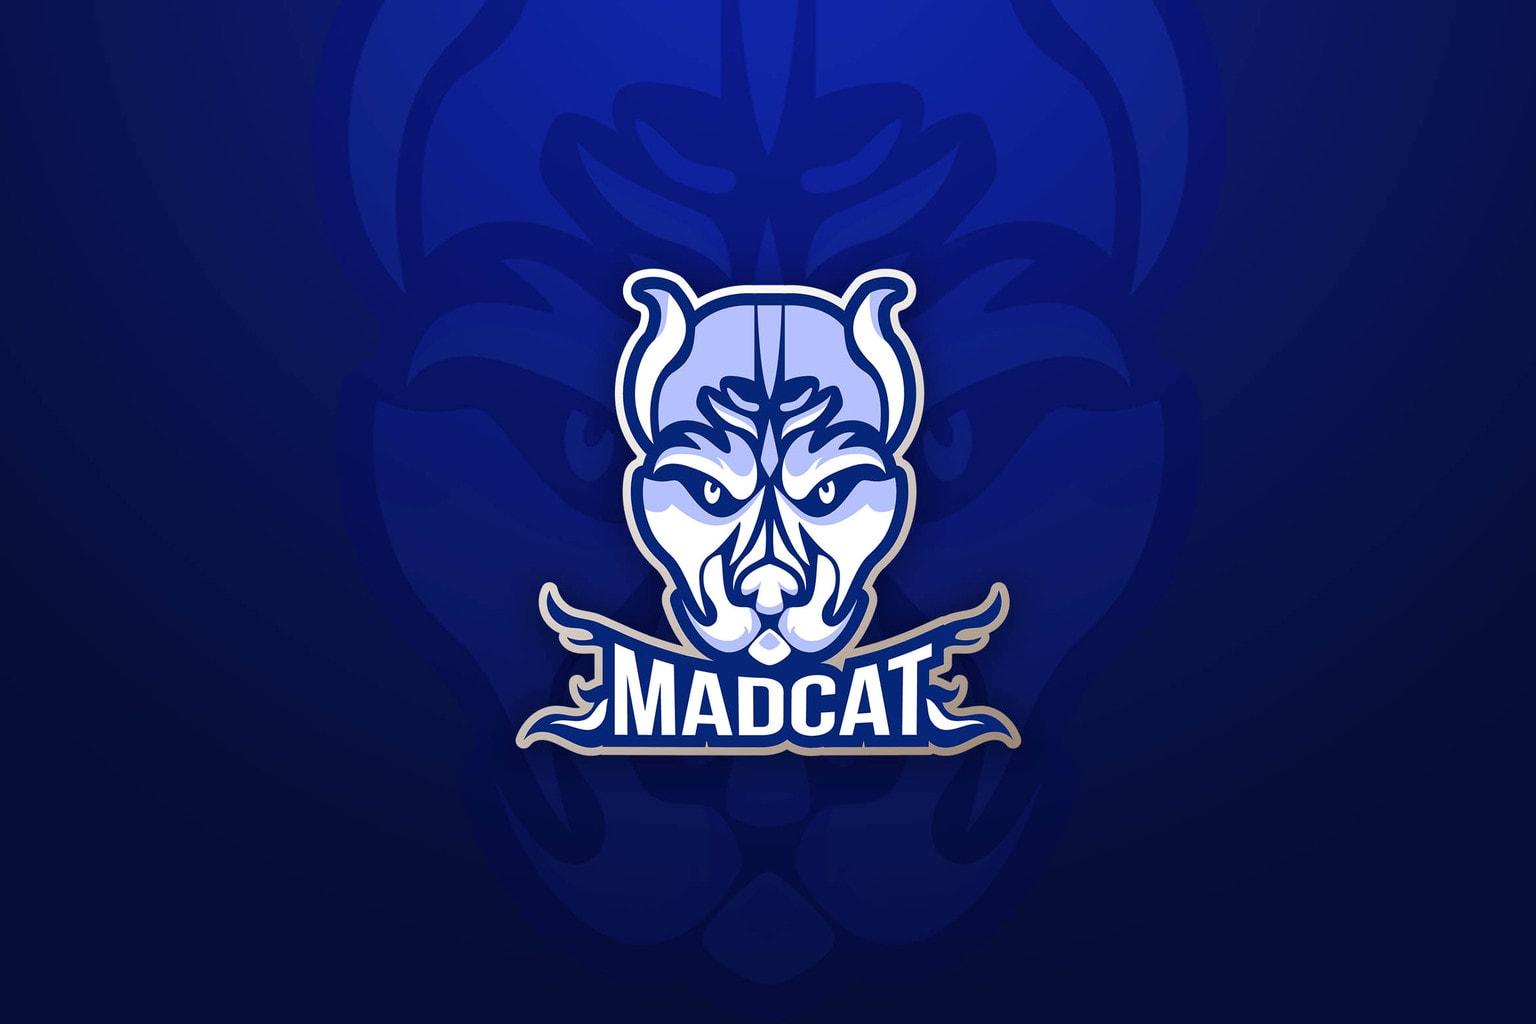 esport logo blue madcat